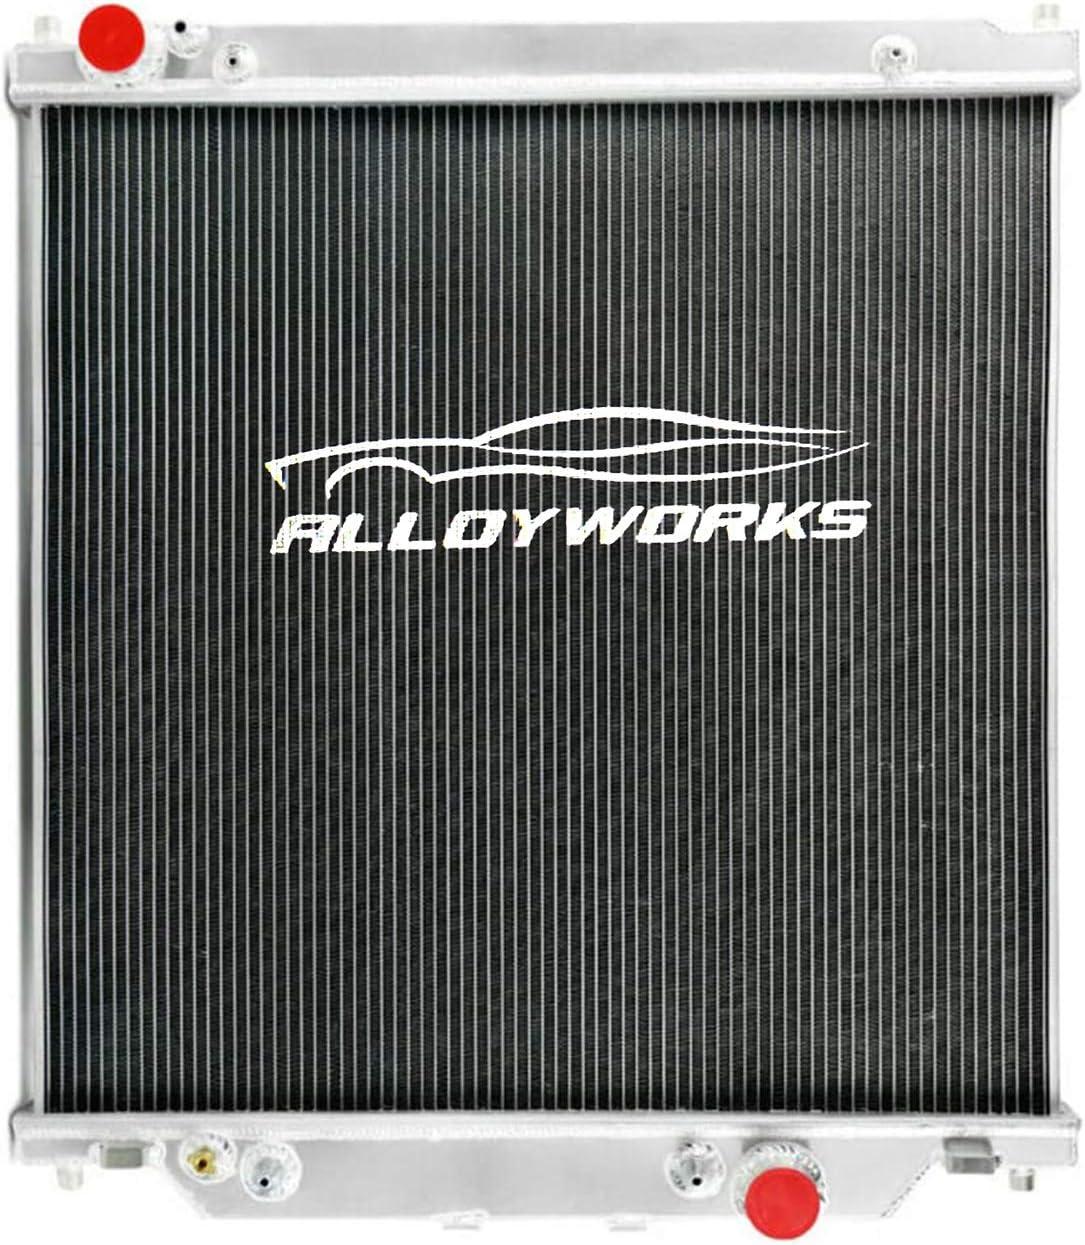 ALLOYWORKS Ford F-Series Radiator, 2 Row All Aluminum Radiator For 2003-2007 Ford F-Series 250/350/450/550/53 Turbo Diesel 6.0L Powerstrok